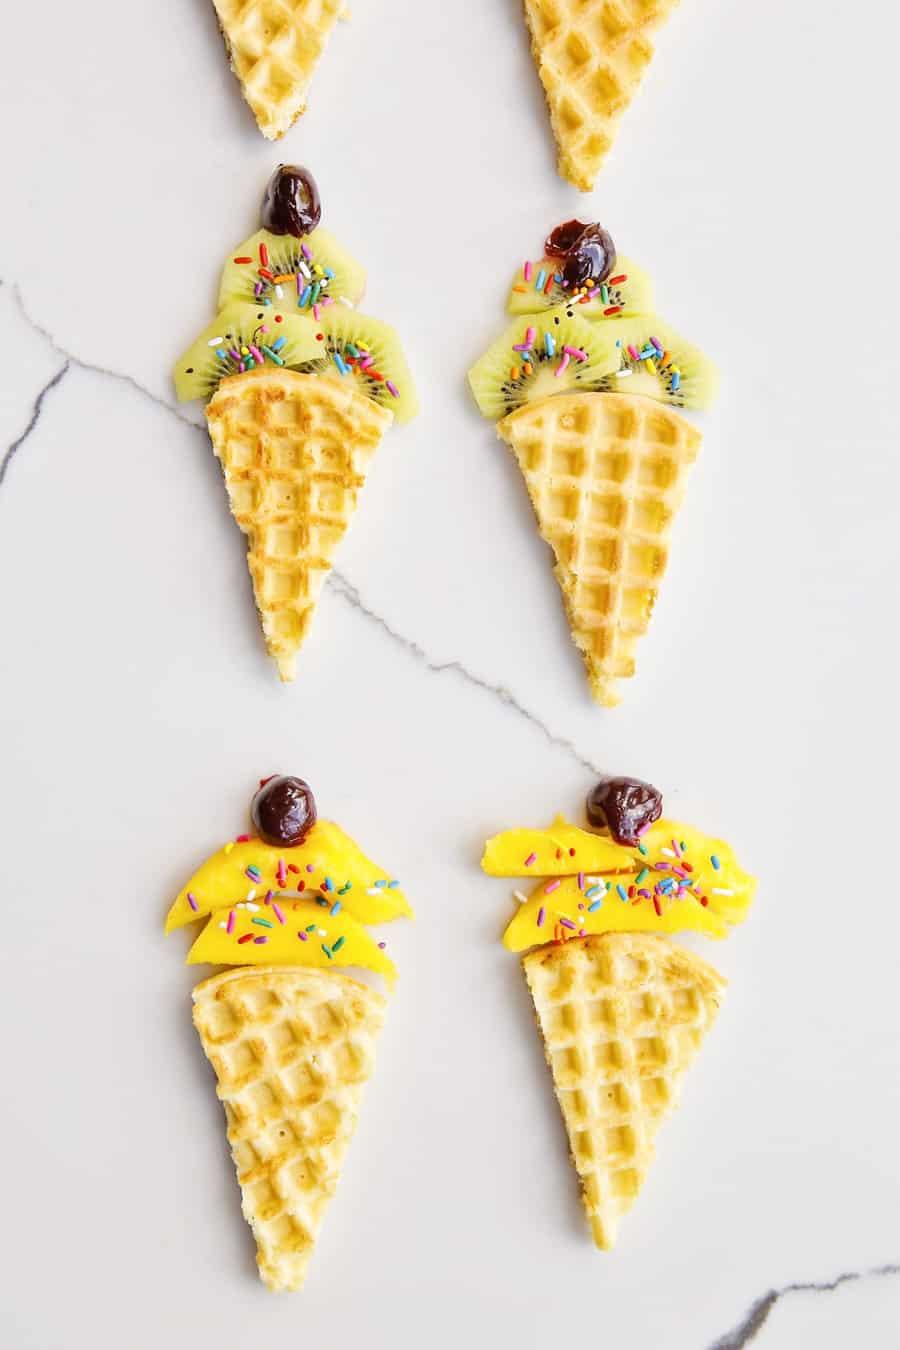 Waffle Fruit Ice Cream Cones